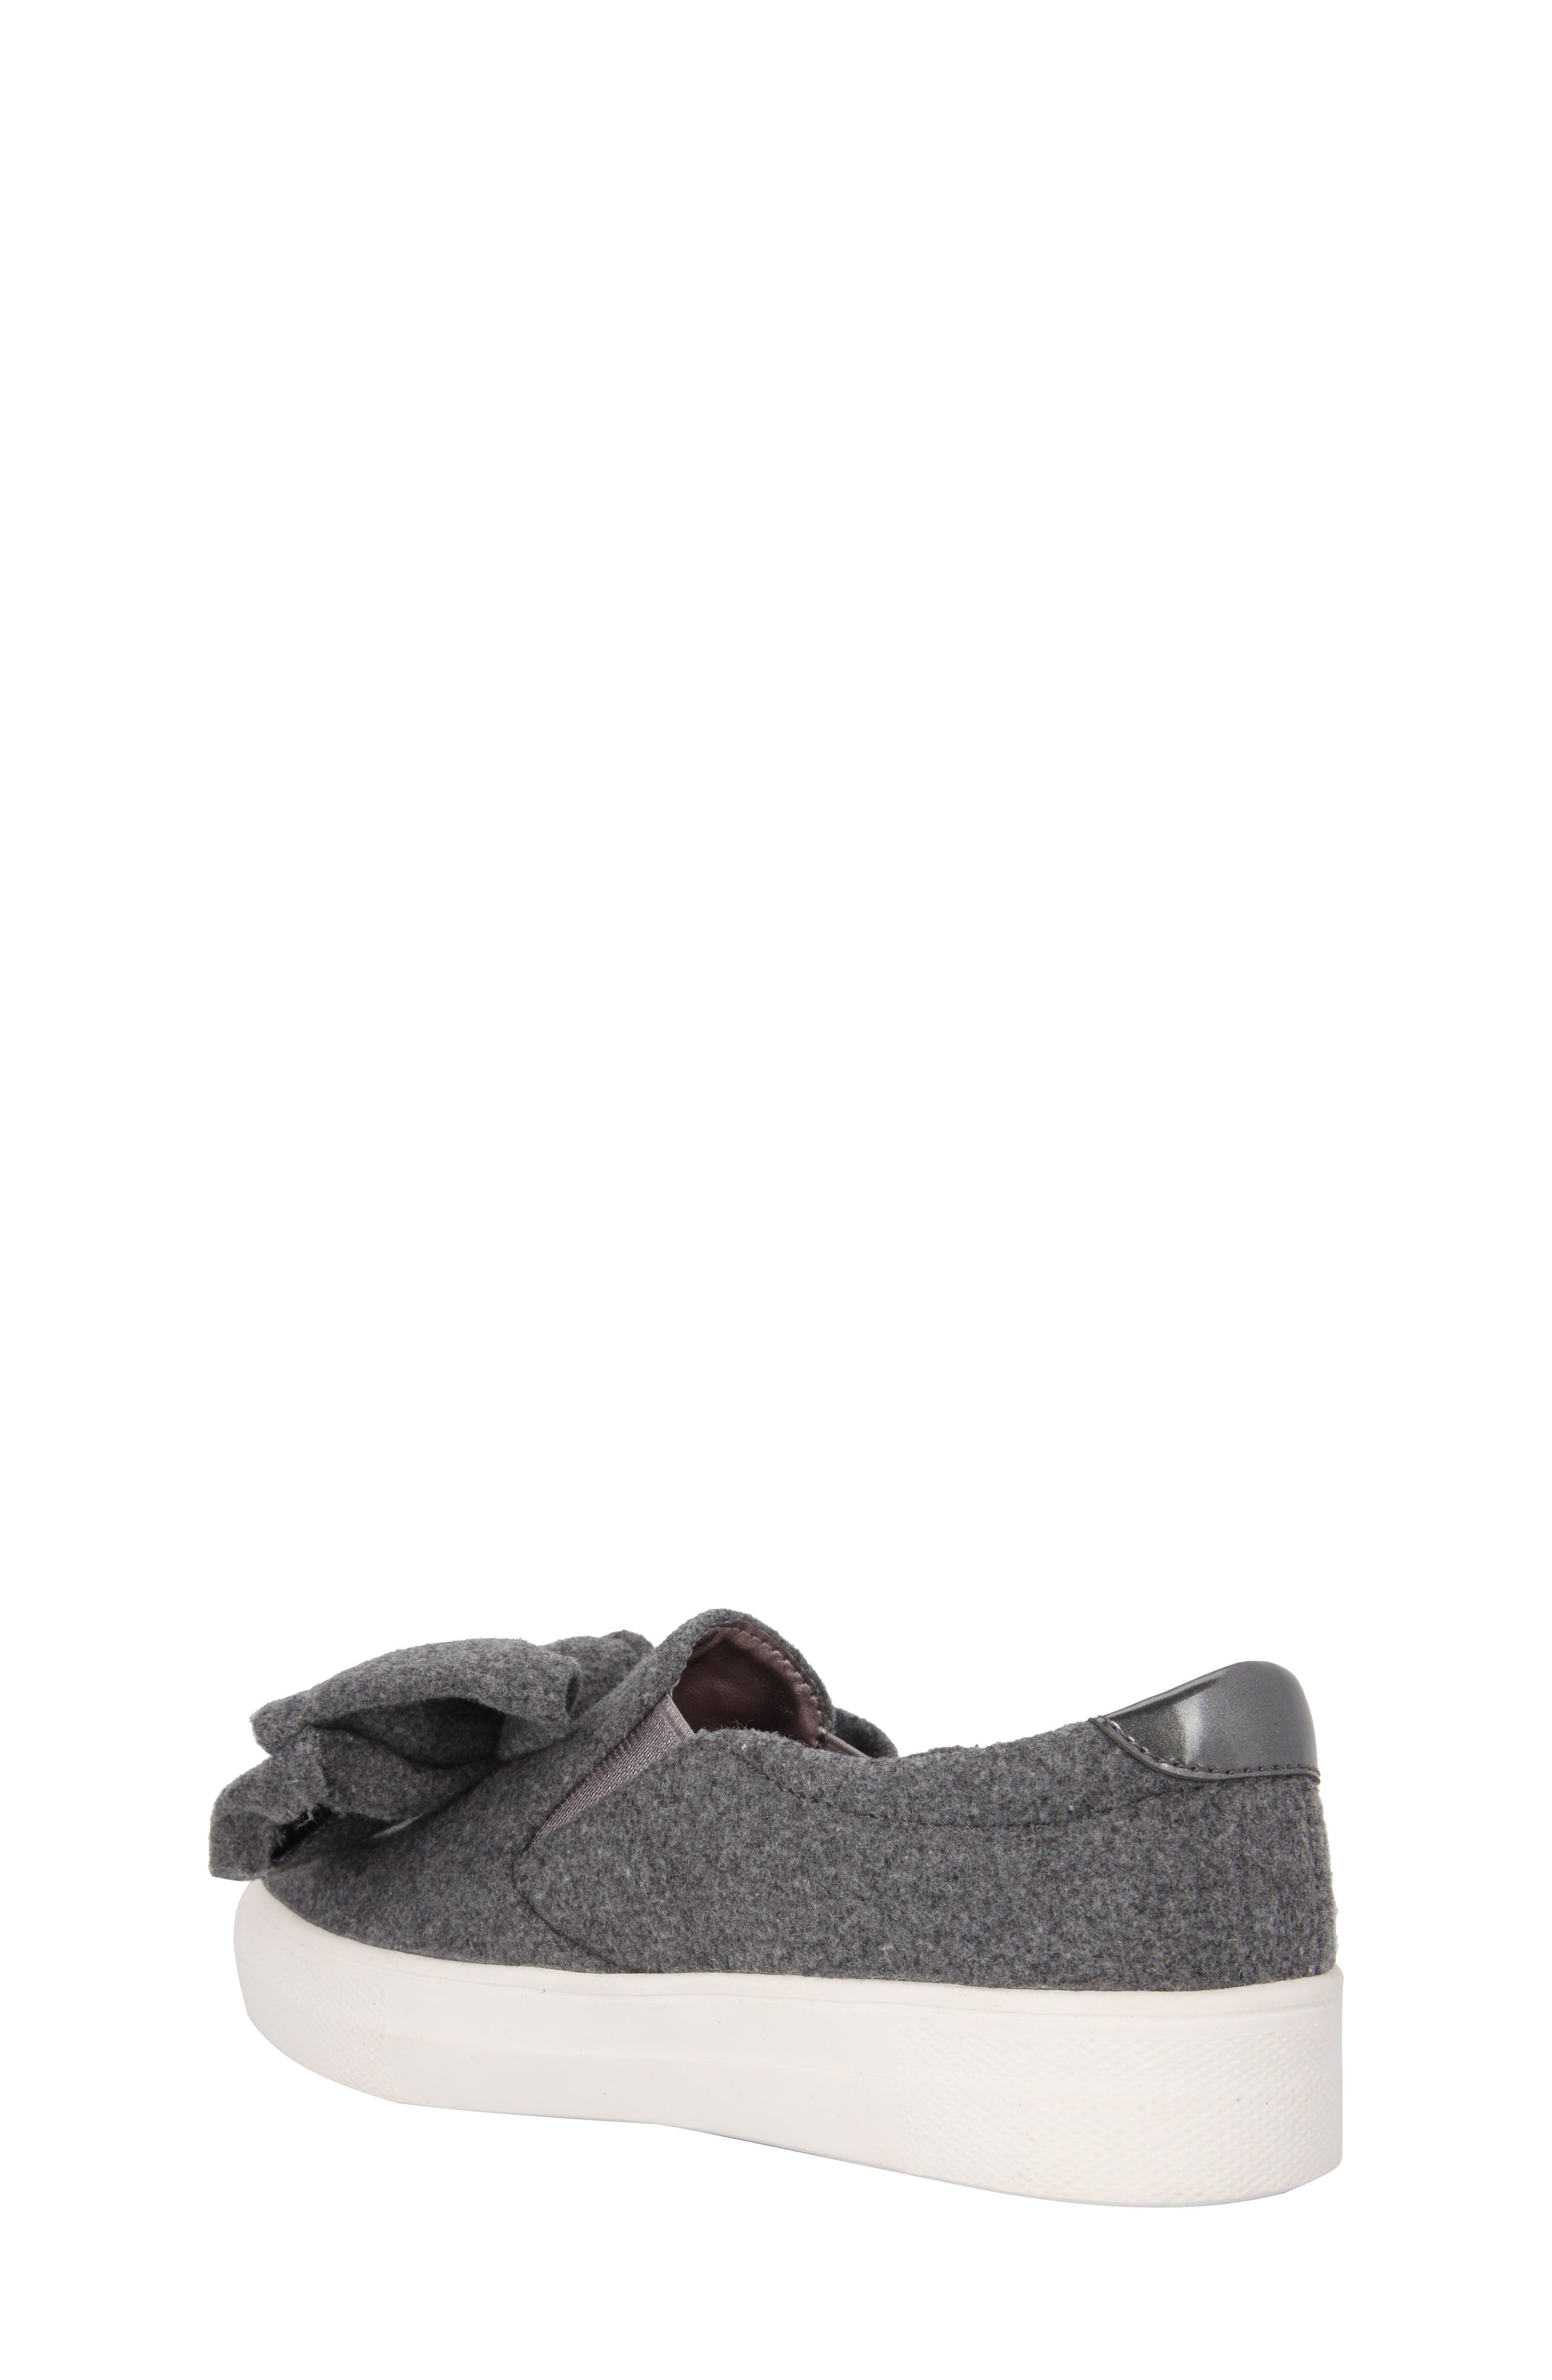 Vaneza Slip-On Bow Sneaker,                             Alternate thumbnail 2, color,                             Grey Flannel